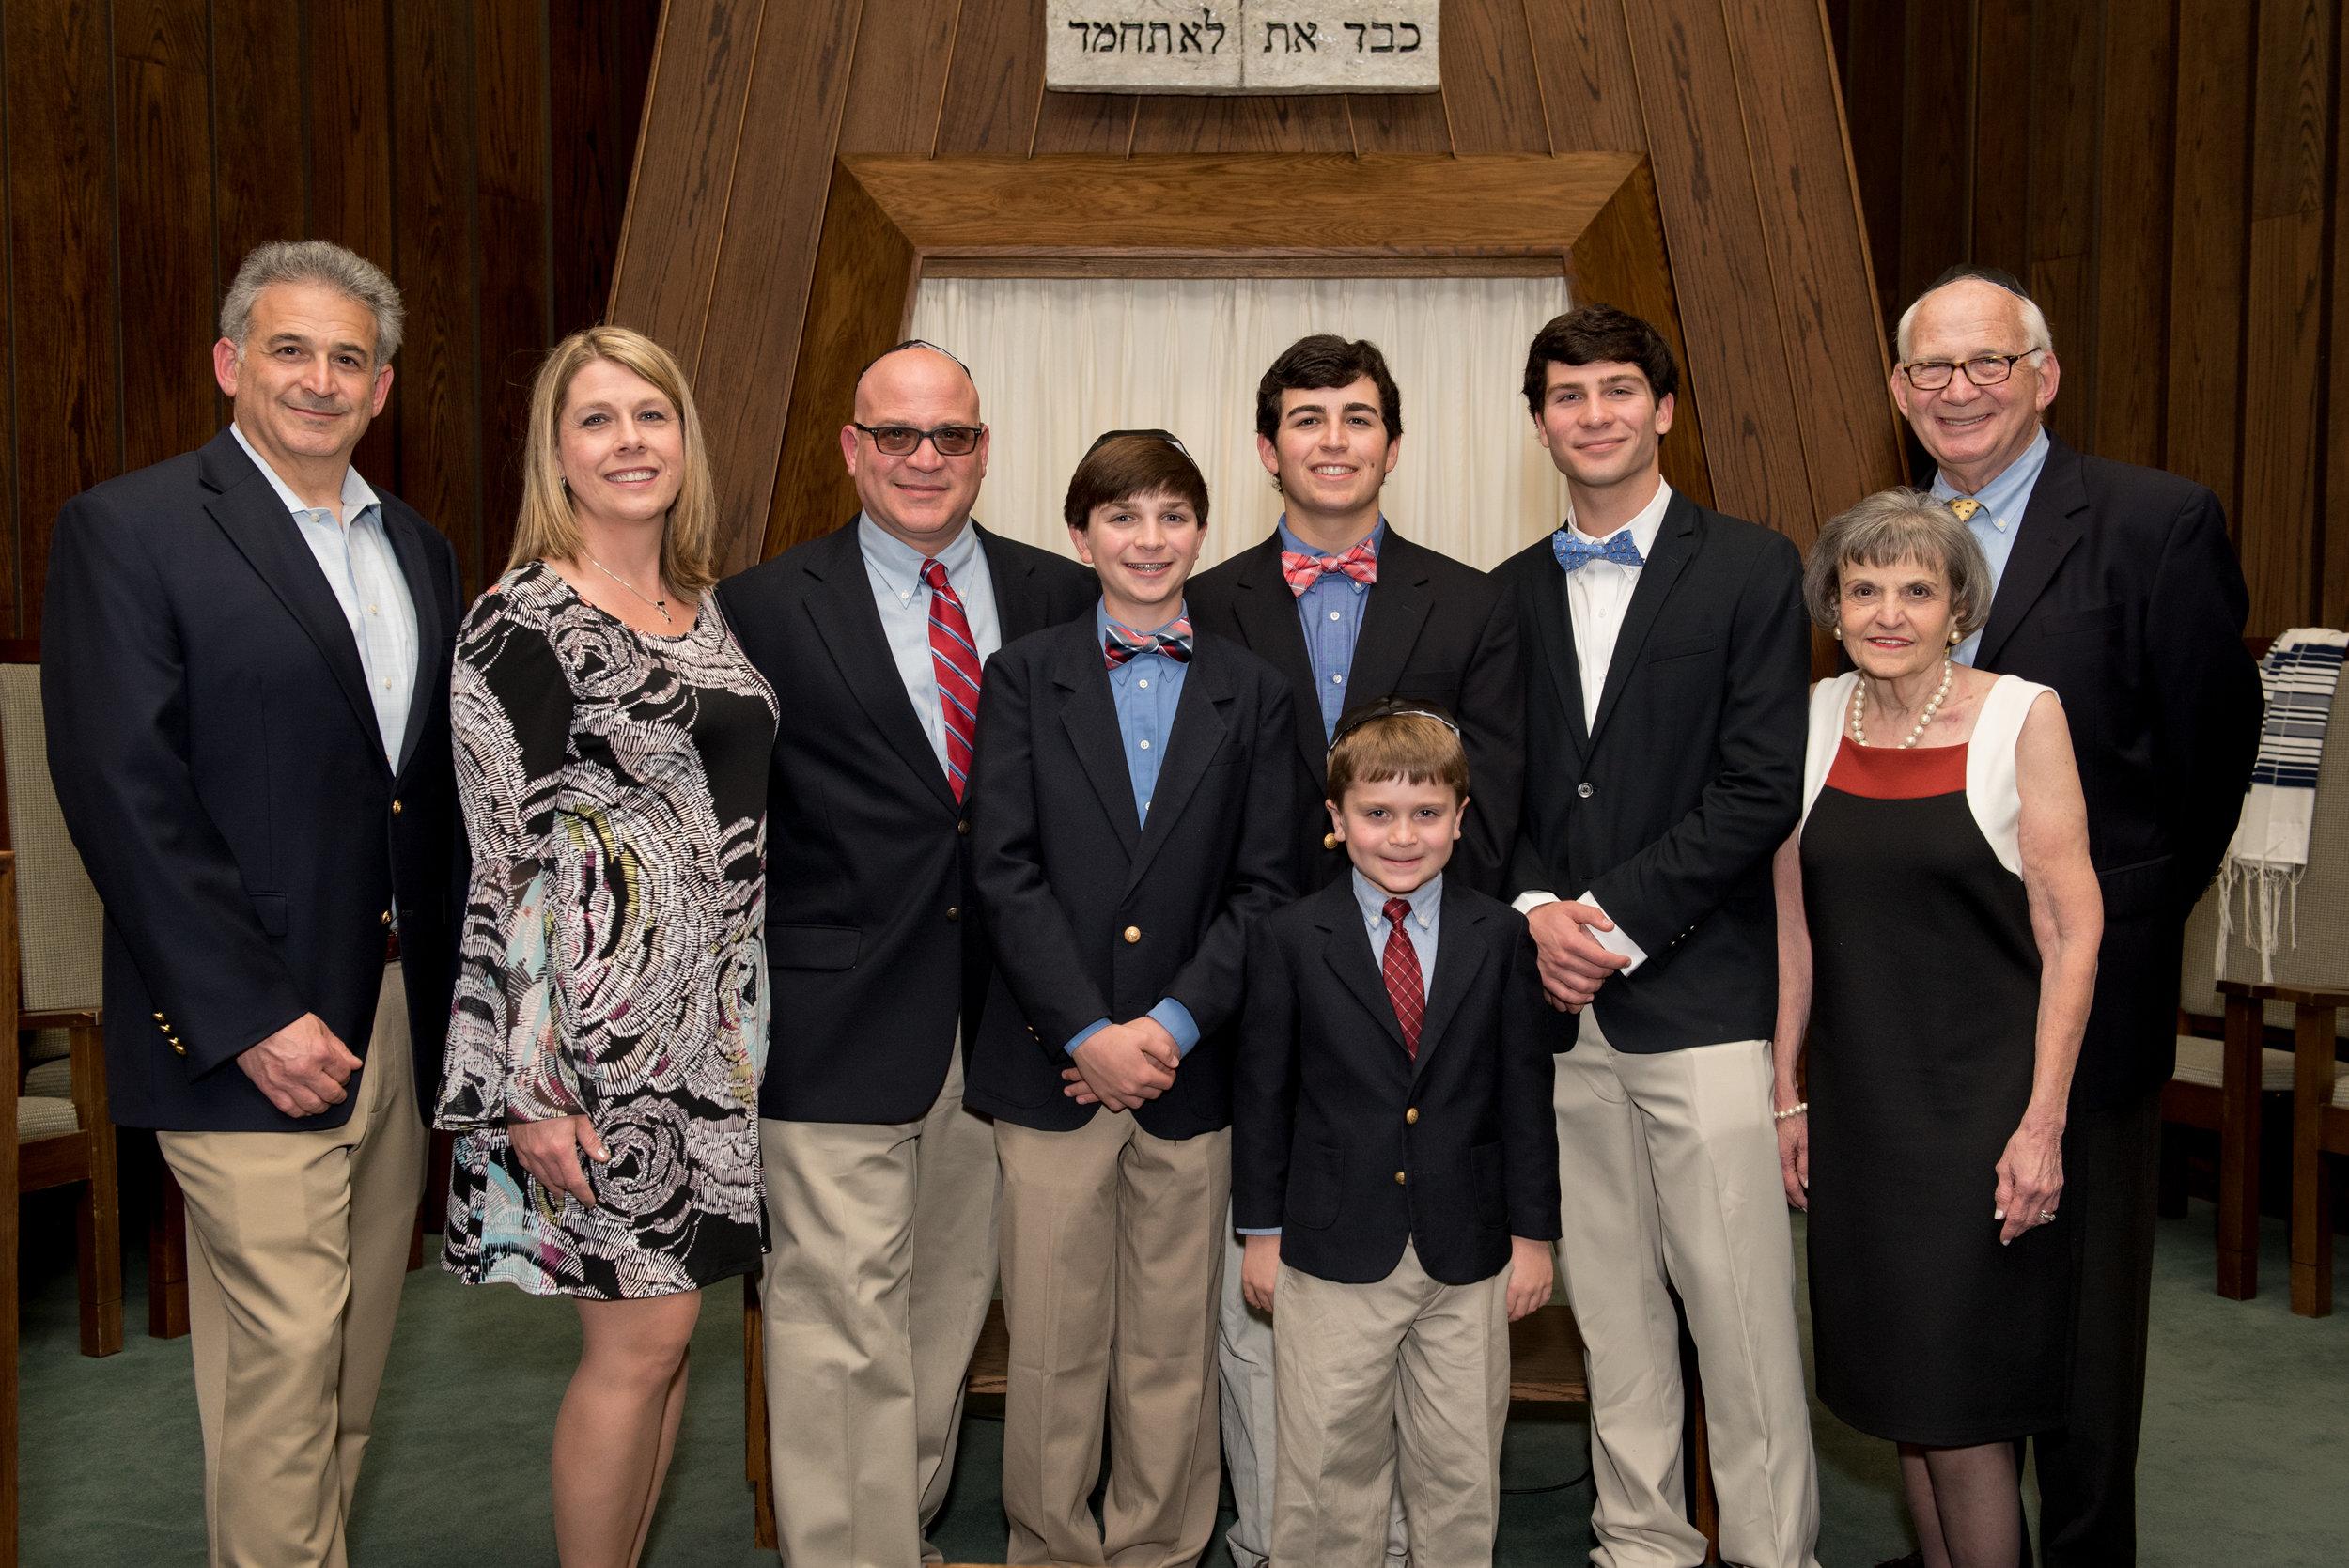 Three generations of the Stark family, including Suzi and Scrappy Stark (at far right).  Image courtesy Randy Stark